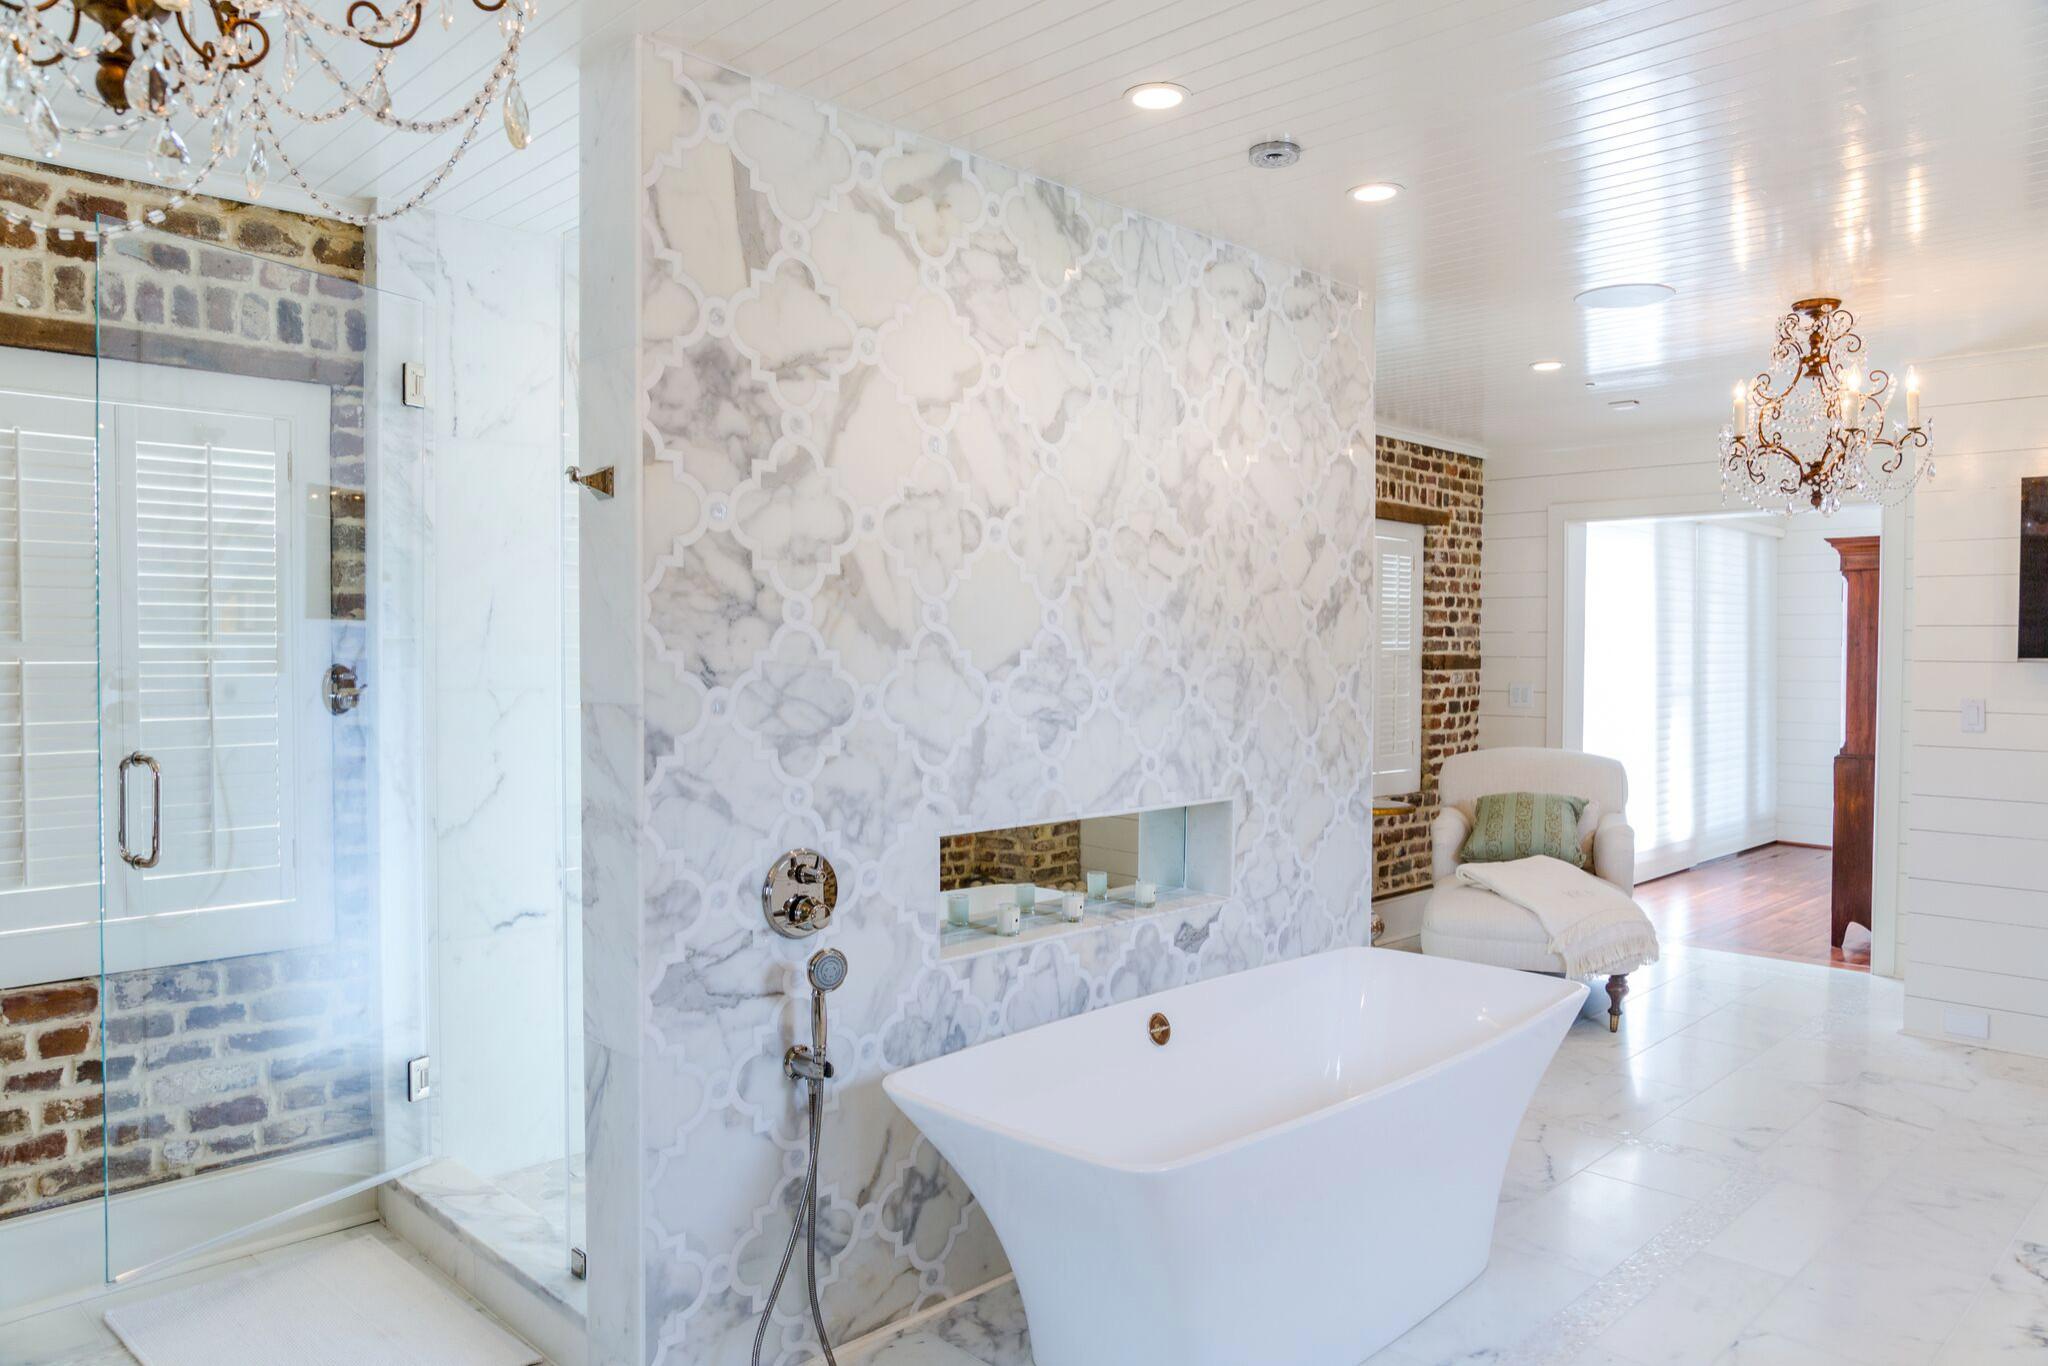 Soaking Tub with a mirrored ledge